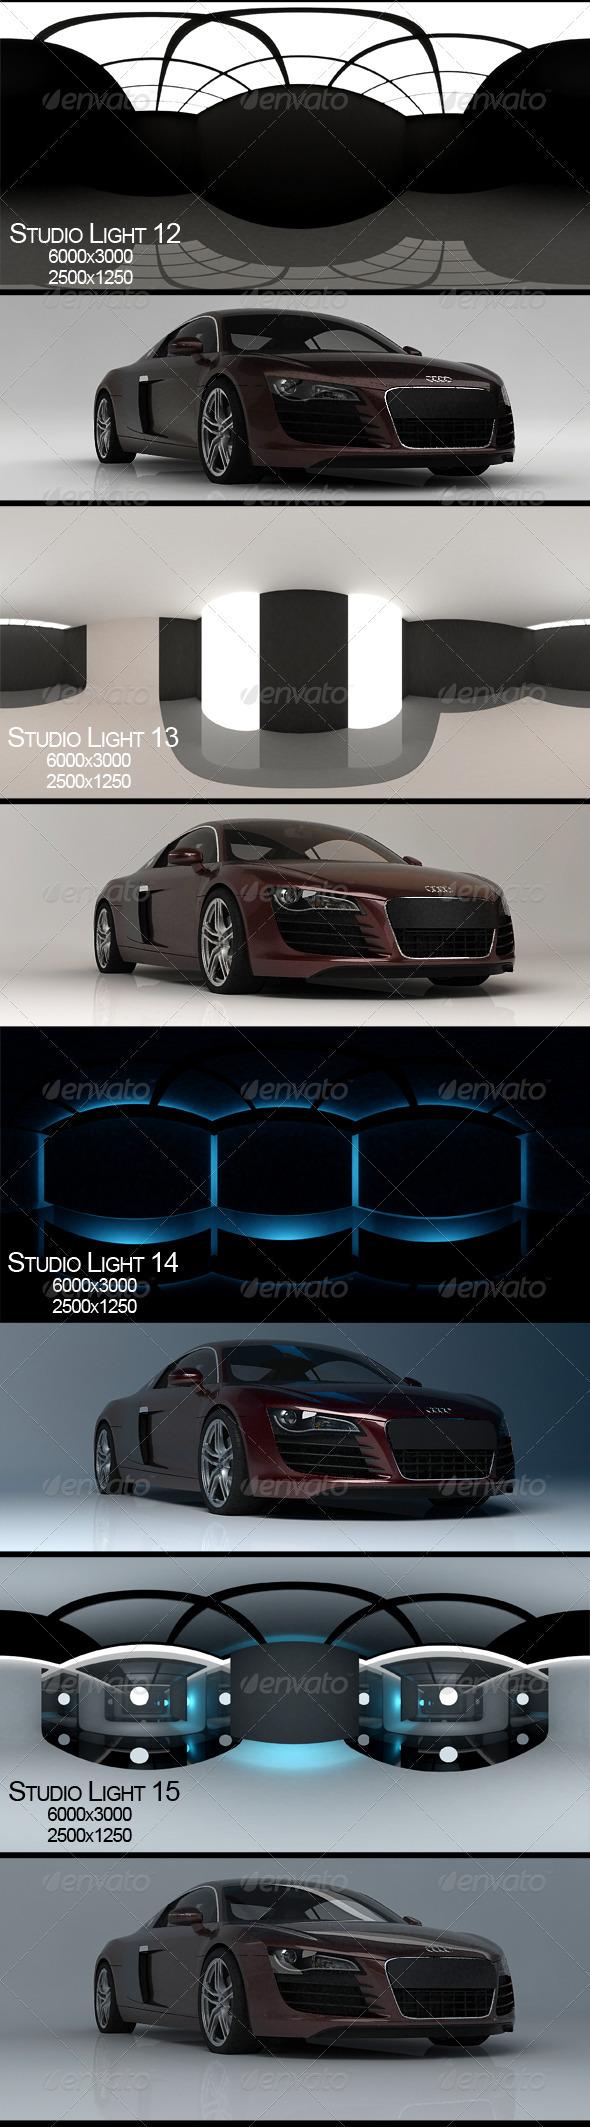 Studio Light 4 - 3DOcean Item for Sale